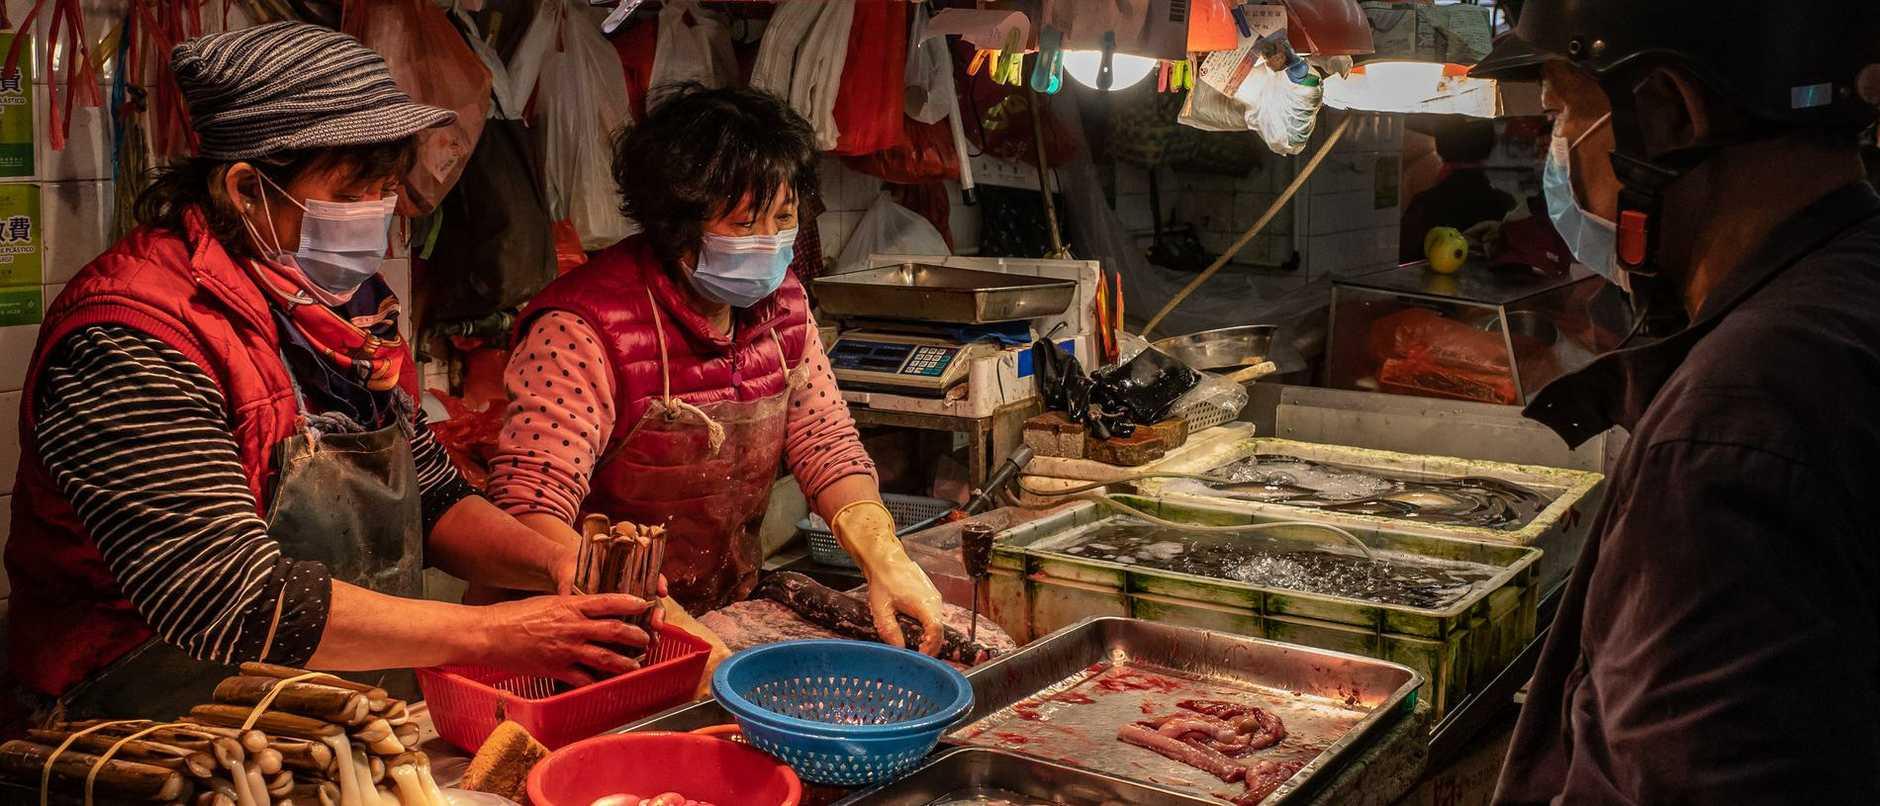 canlı hayvan pazarı